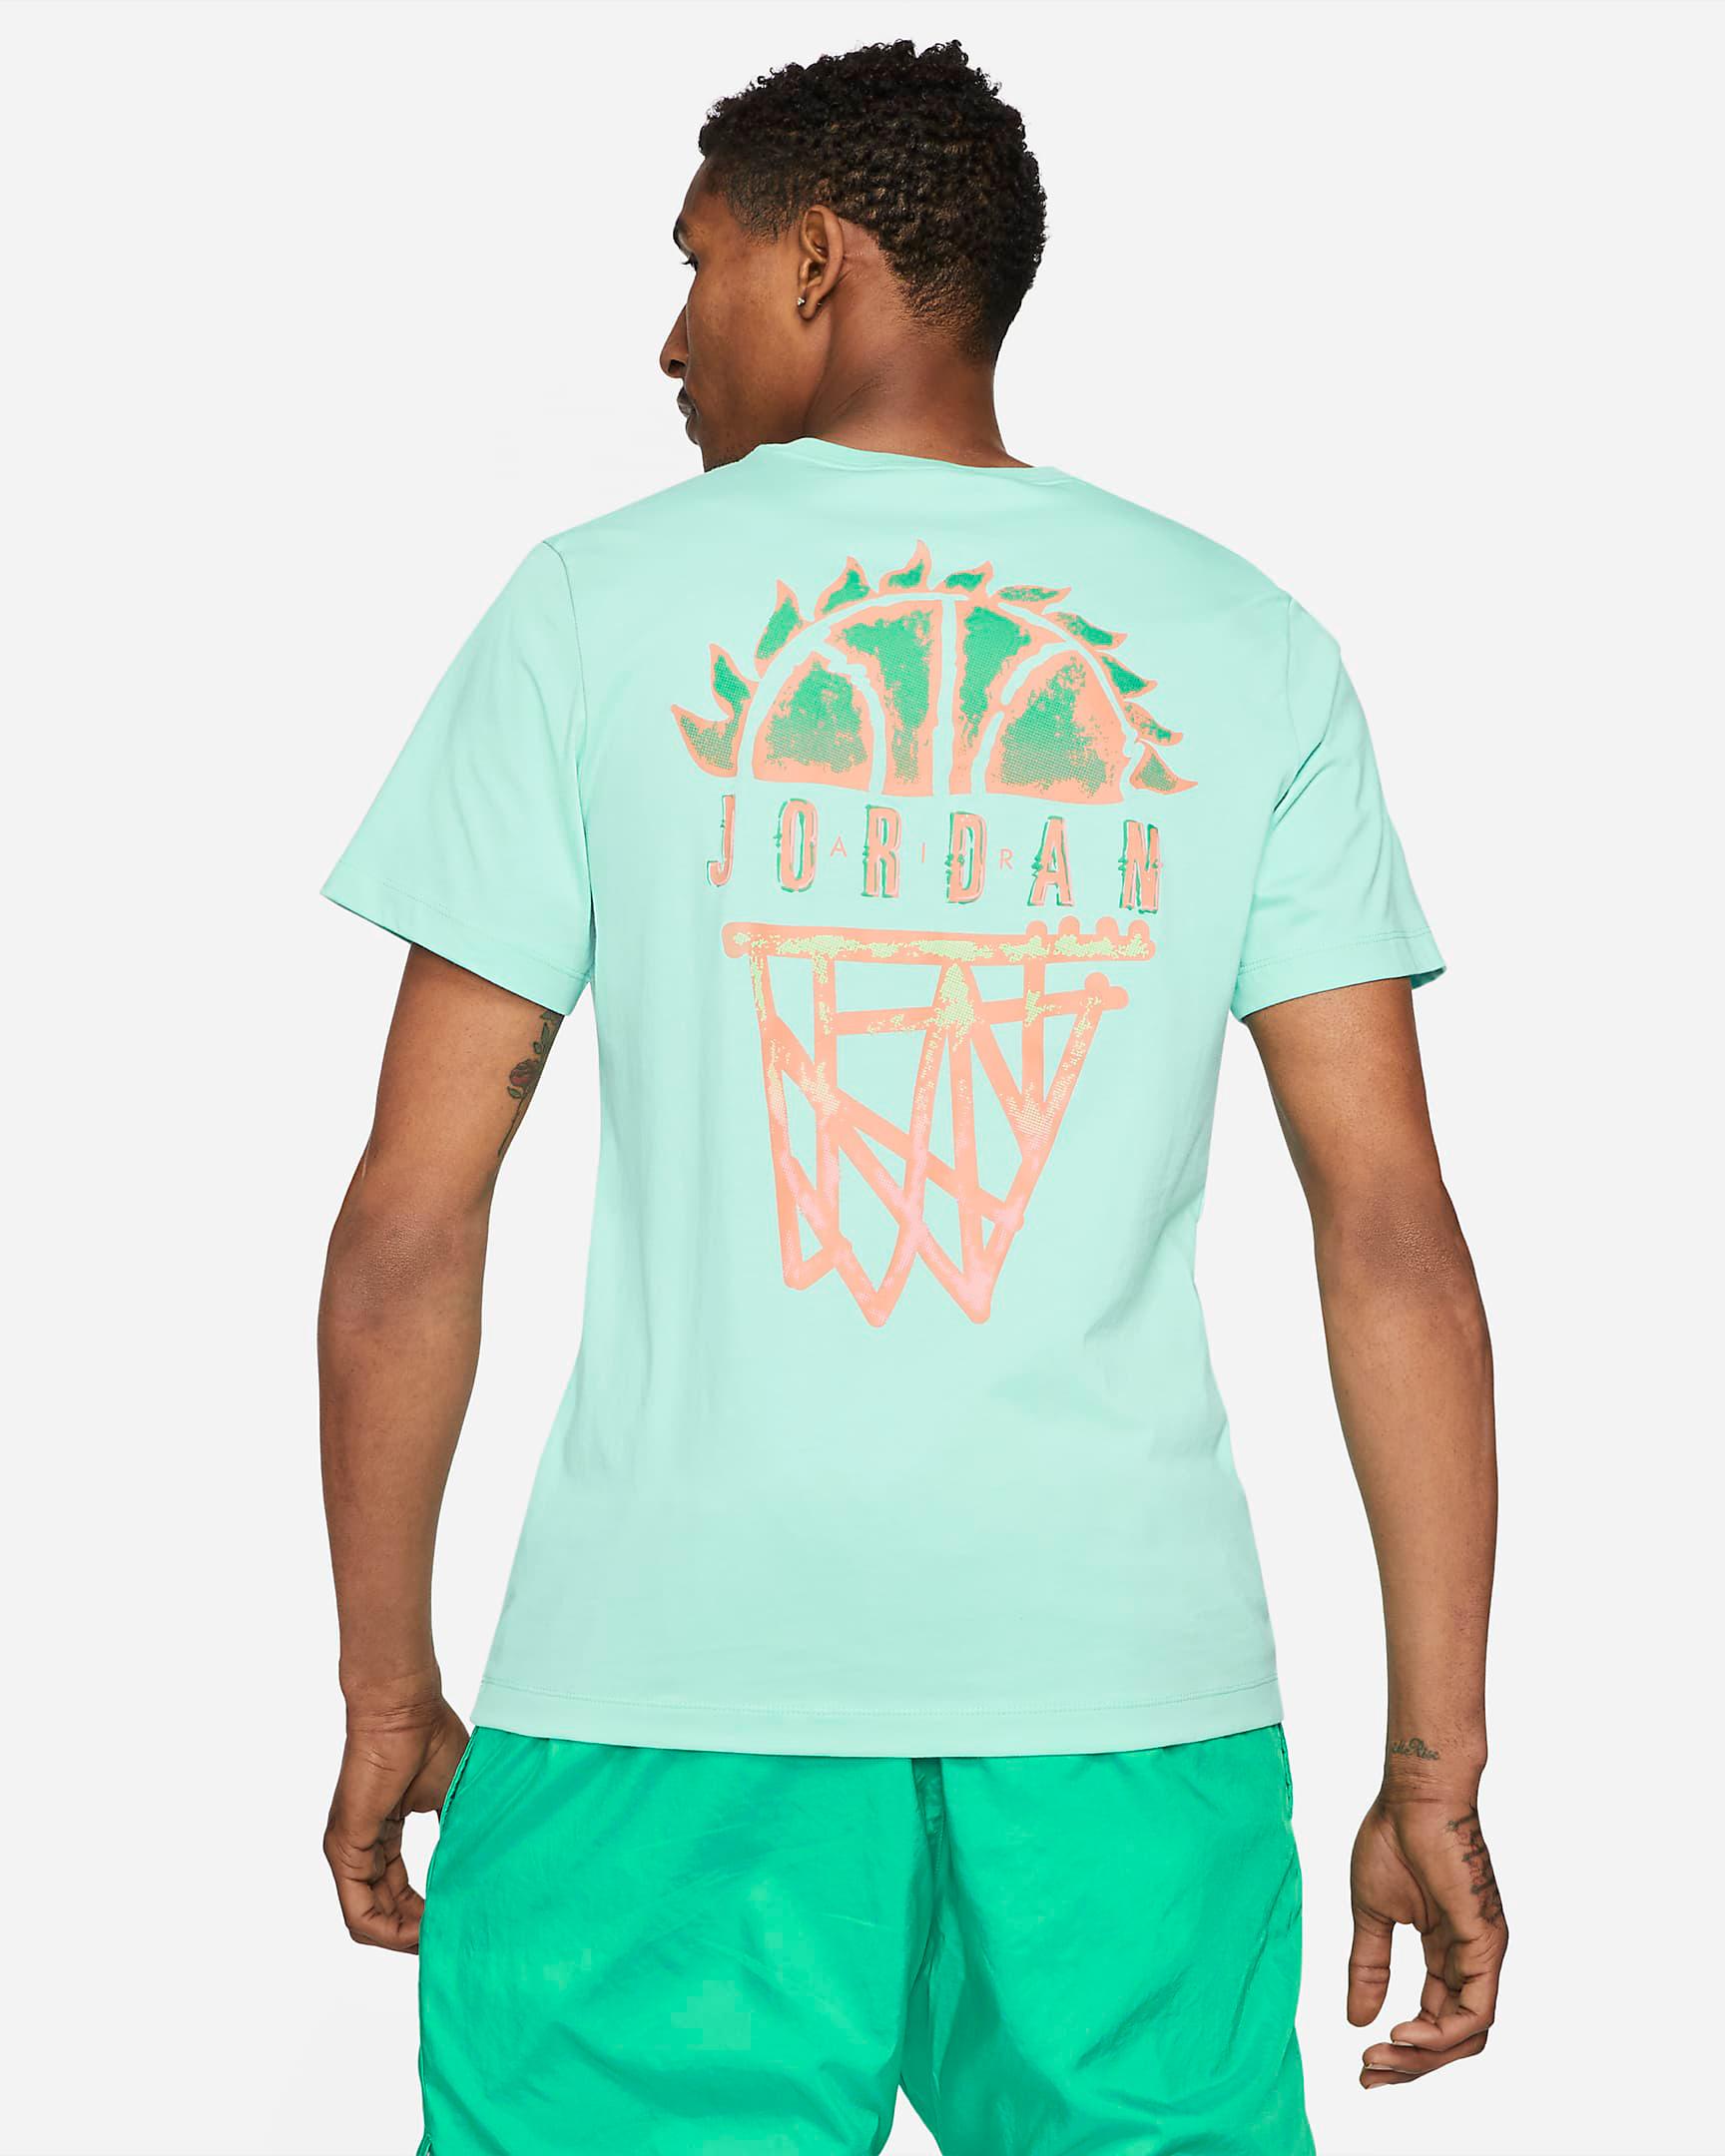 jordan-tropical-twist-sport-dna-shirt-2